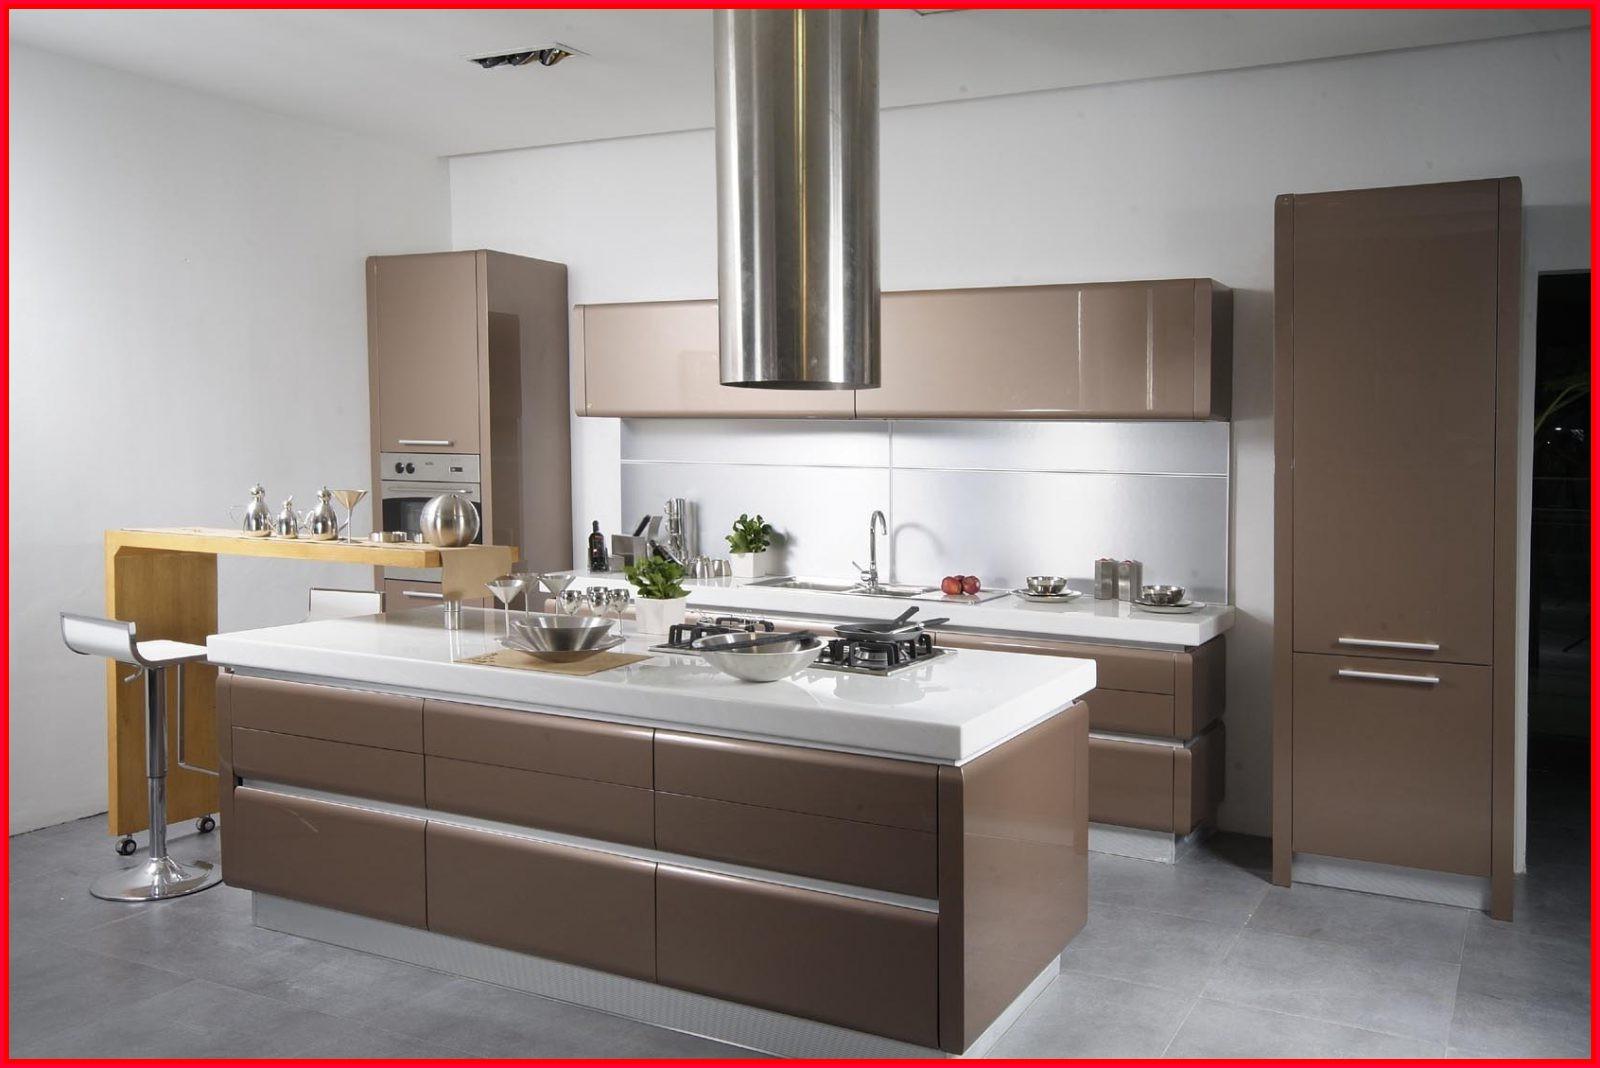 Imilk.info = muebles de cocina en kit las palmas ~ Ideas de ...